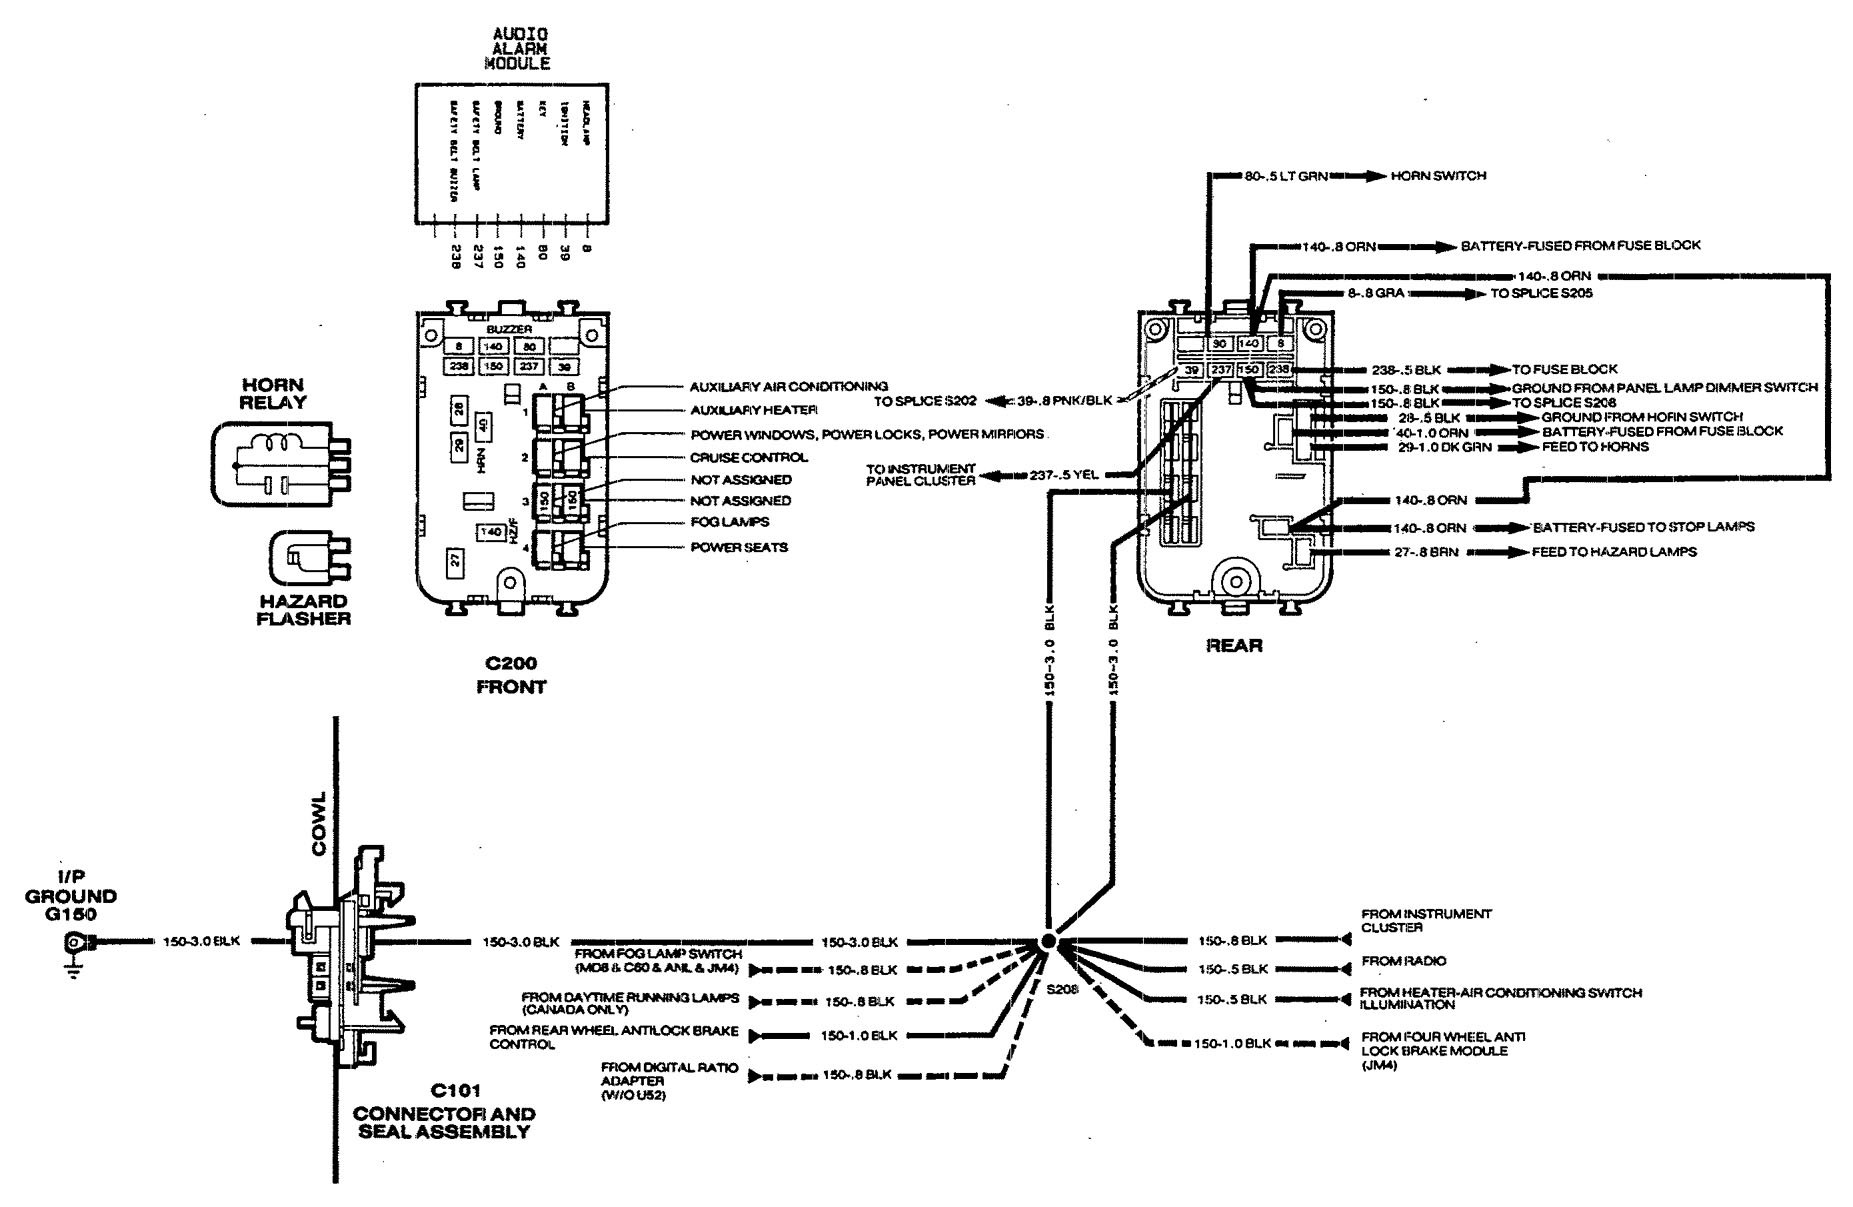 95 Astro Wiring Diagram - Wiring Diagram Write on 1999 chevy astro van wiring diagram, 2000 chevy venture wiring-diagram, 2000 chevy astro van exhaust, 1994 chevy astro van wiring diagram, 2000 chevy astro van vacuum diagram, 2004 chevy suburban wiring diagram, 2000 chevy express fuel pump wiring, chevy astro engine diagram, 2000 chevy astro van parts, 1984 chevy corvette wiring diagram, 2000 chevy silverado ignition wiring diagram, 1998 chevy astro van wiring diagram, 2000 chevy cavalier wiring diagram, 2003 chevy s10 wiring diagram, 98 chevy s10 wiring diagram, 2000 chevy s10 wiring diagram, 1986 chevy blazer wiring diagram, 2003 chevy monte carlo wiring diagram, 2000 chevy astro van headlights, 2000 chevy tracker wiring-diagram,